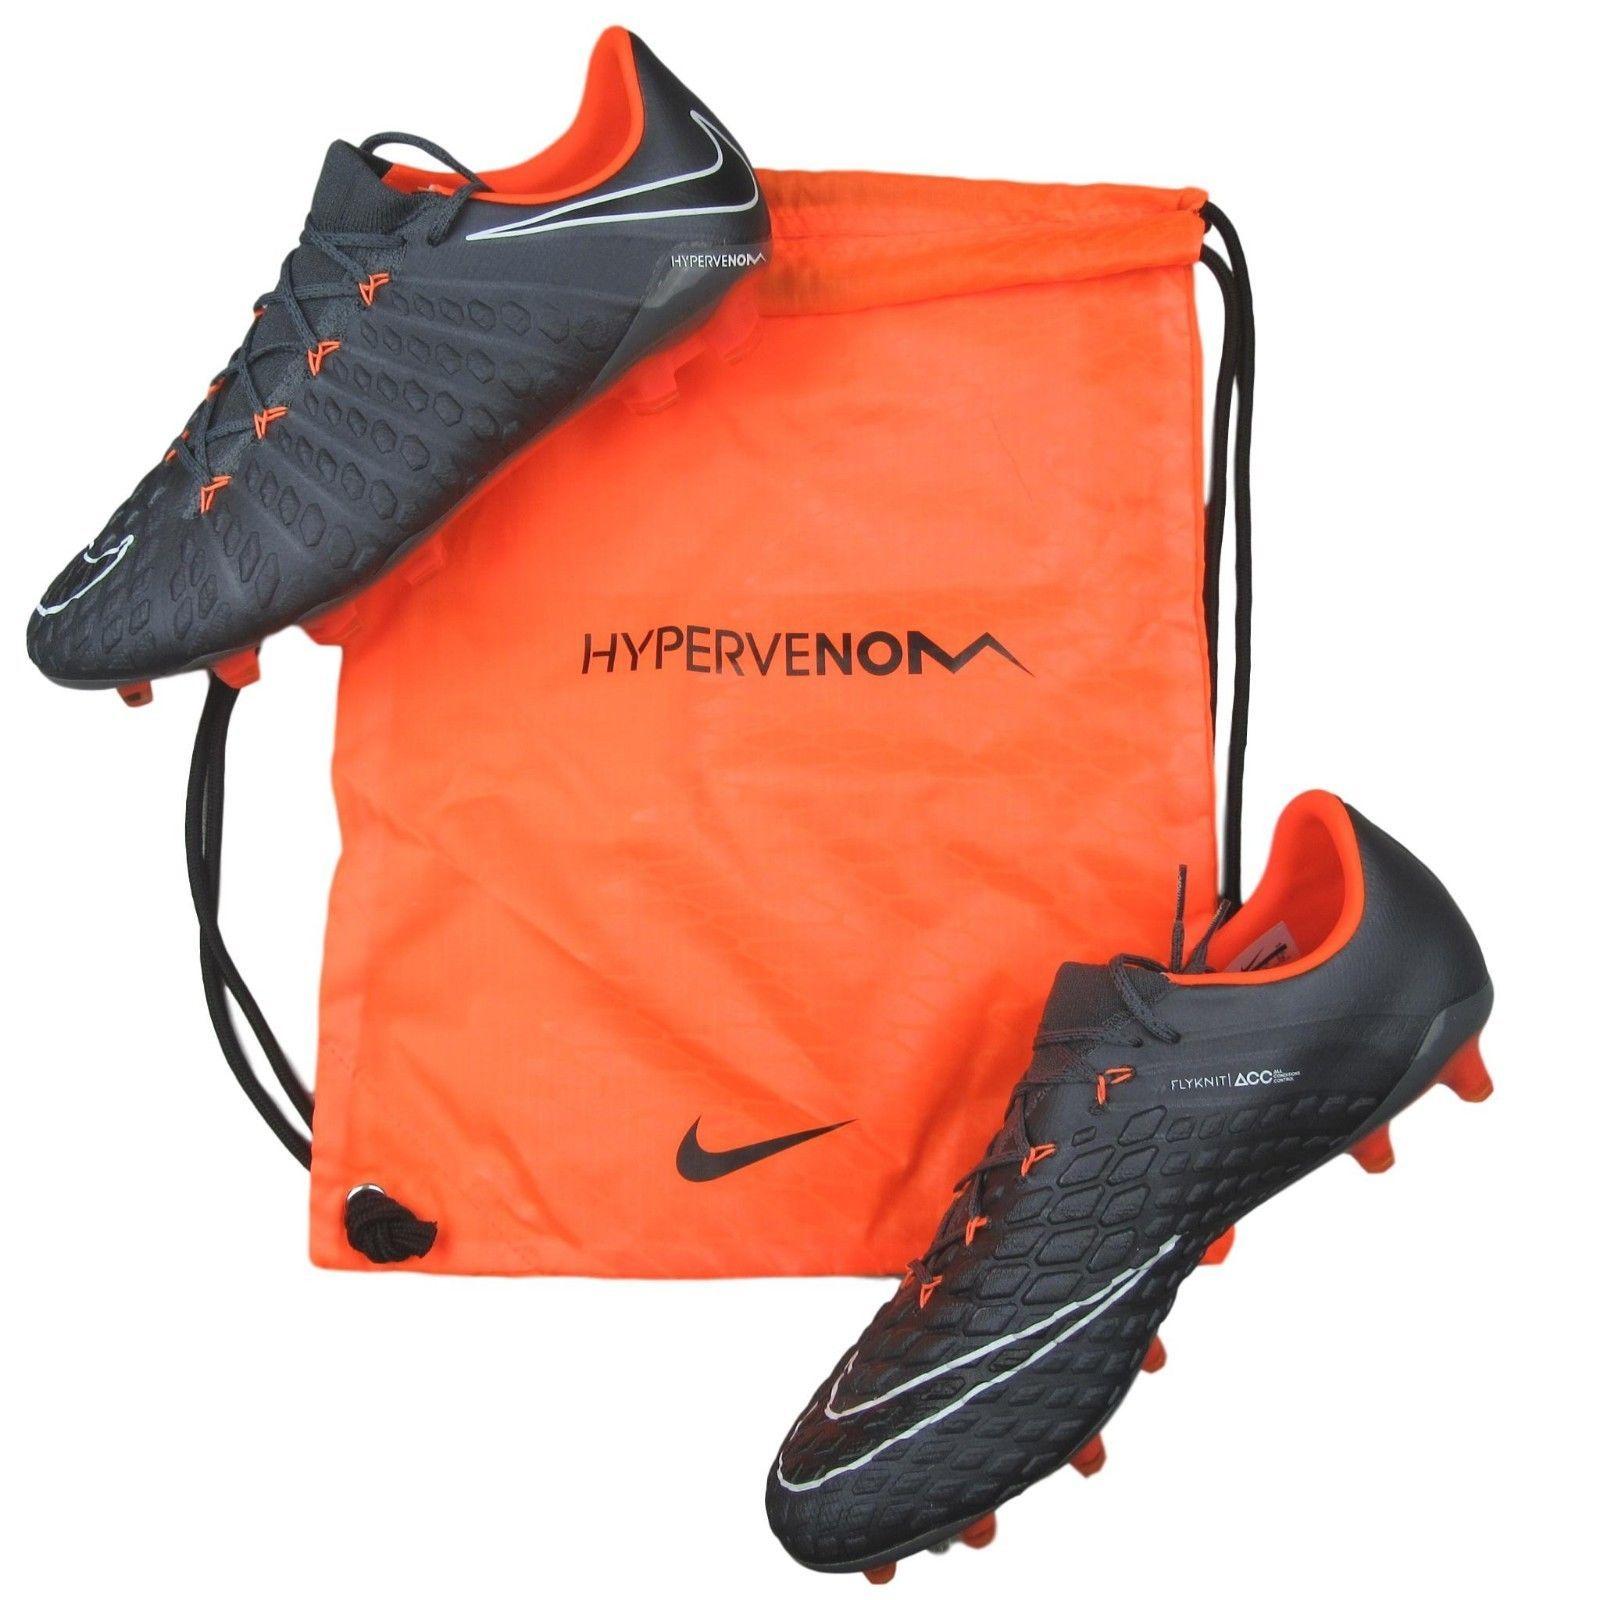 8f33dd364 Nike Phantom Elite 3 III FG Soccer Cleats and 50 similar items